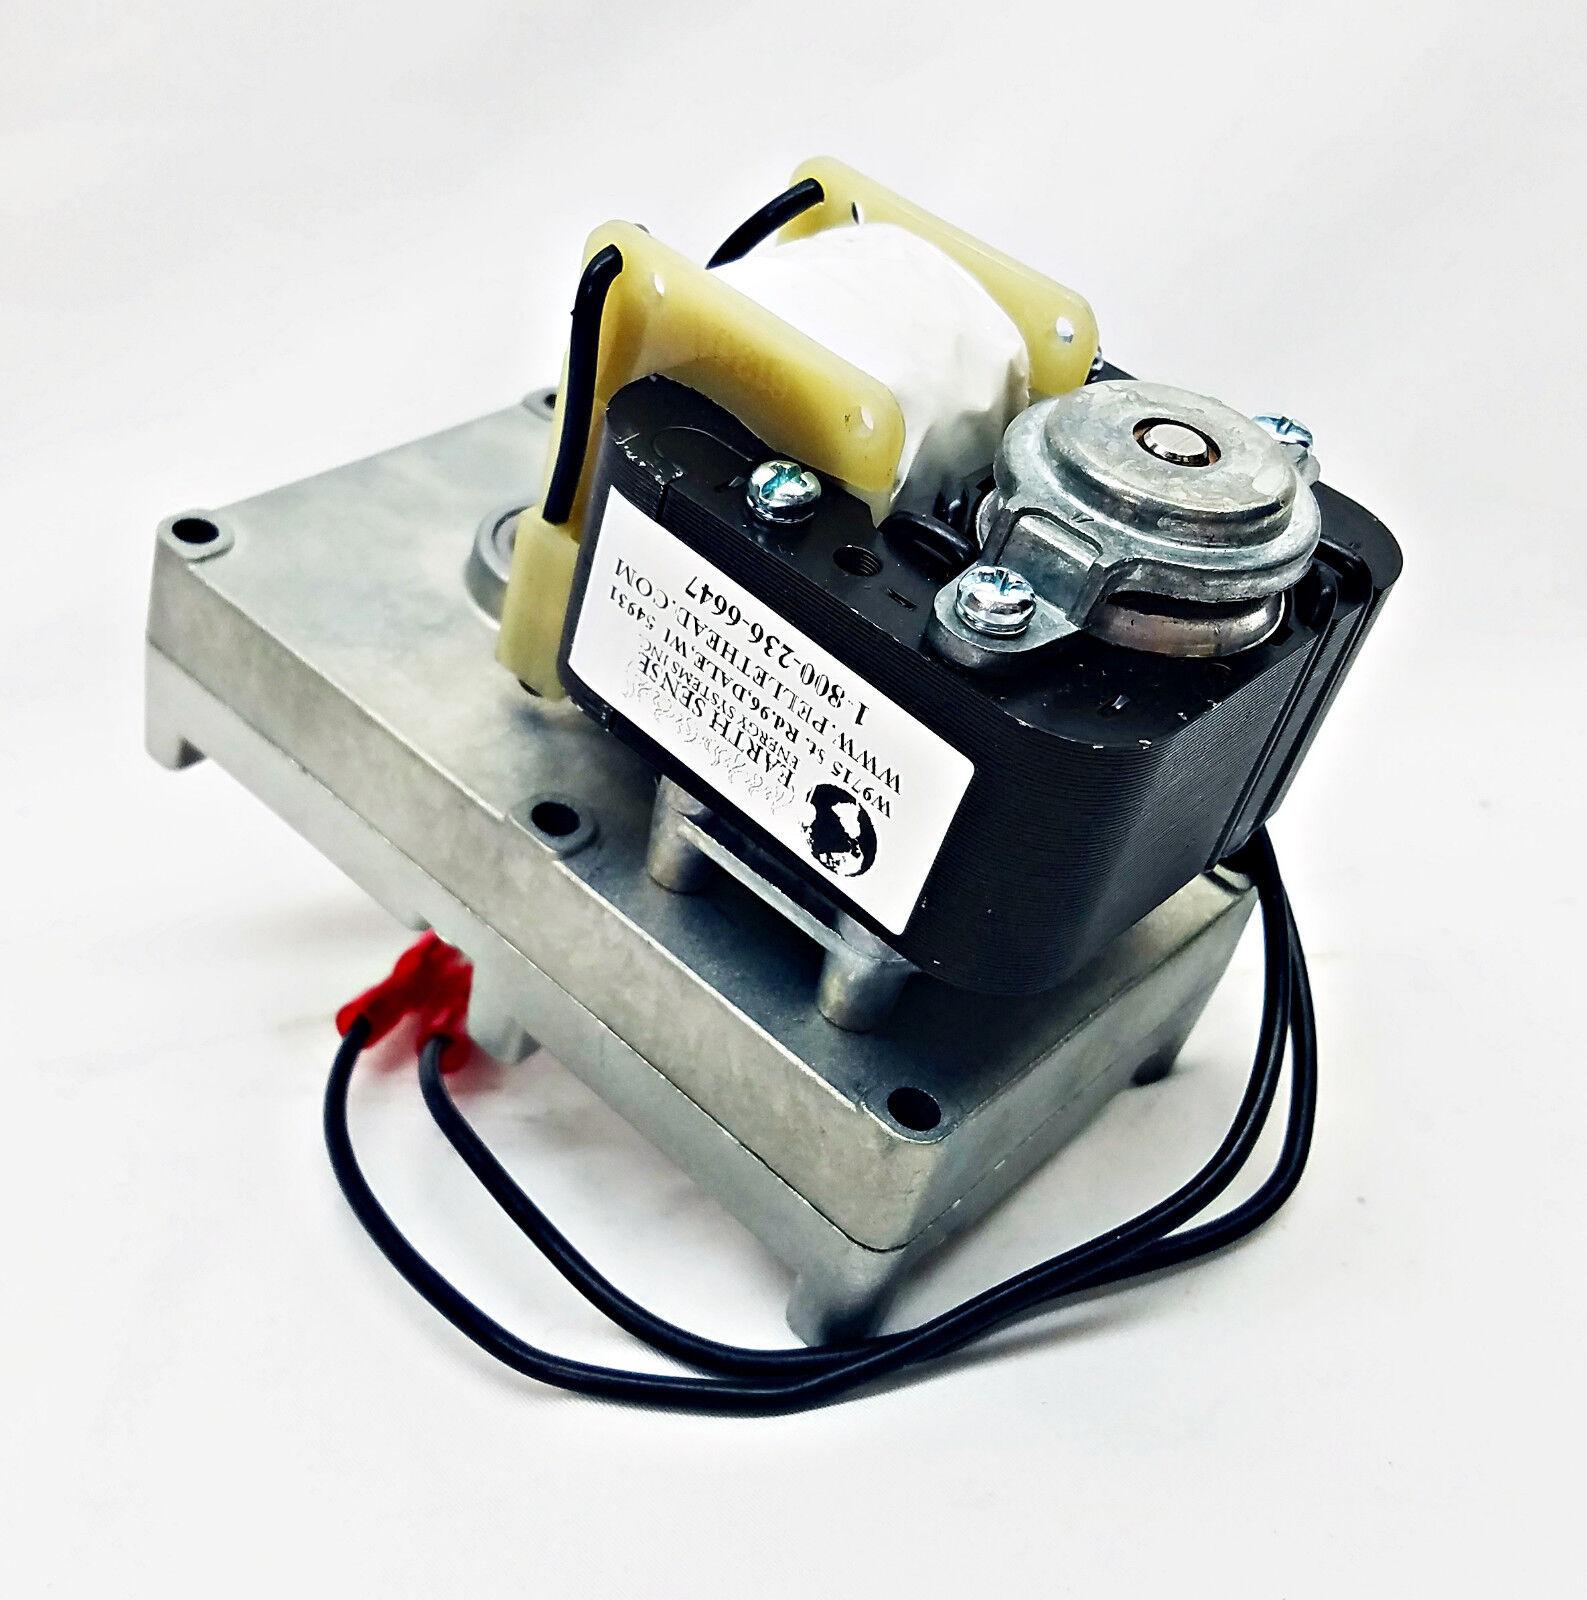 Harman Auger Motor - Advance, Accentra, XXV, 4 RPM CCW - 3-20-08752   PH-CCW4